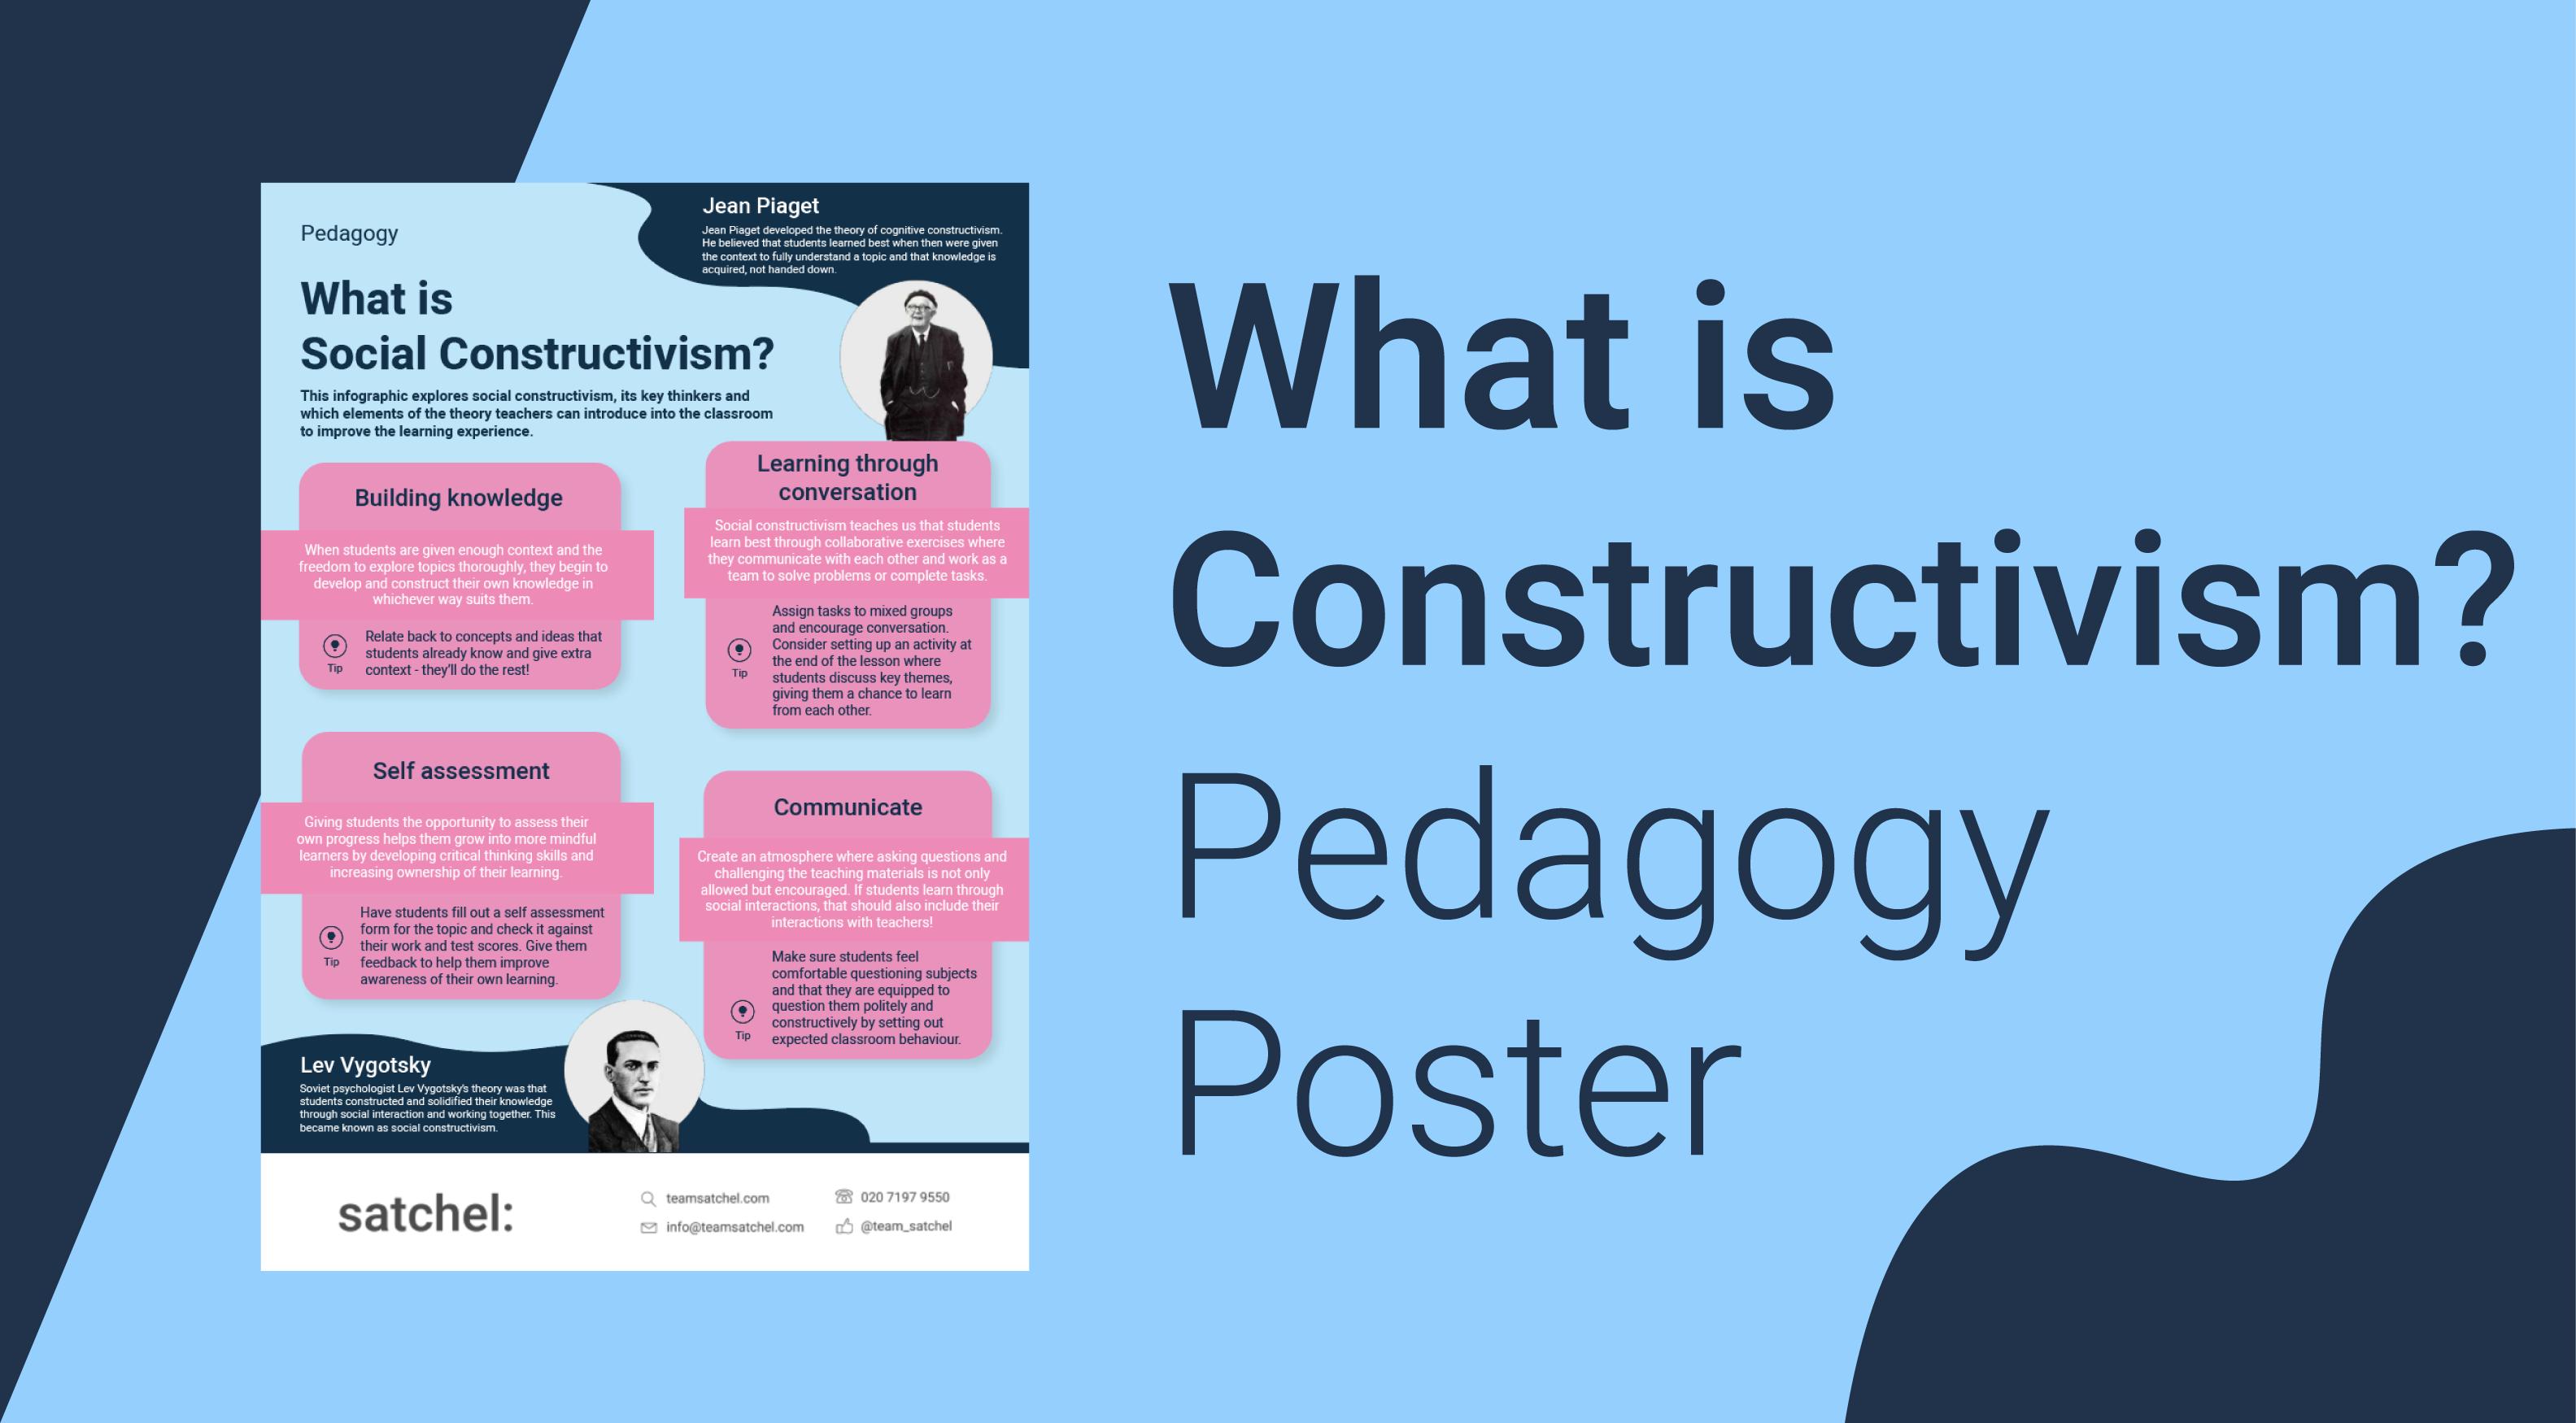 Pedagogy Constructivism Poster